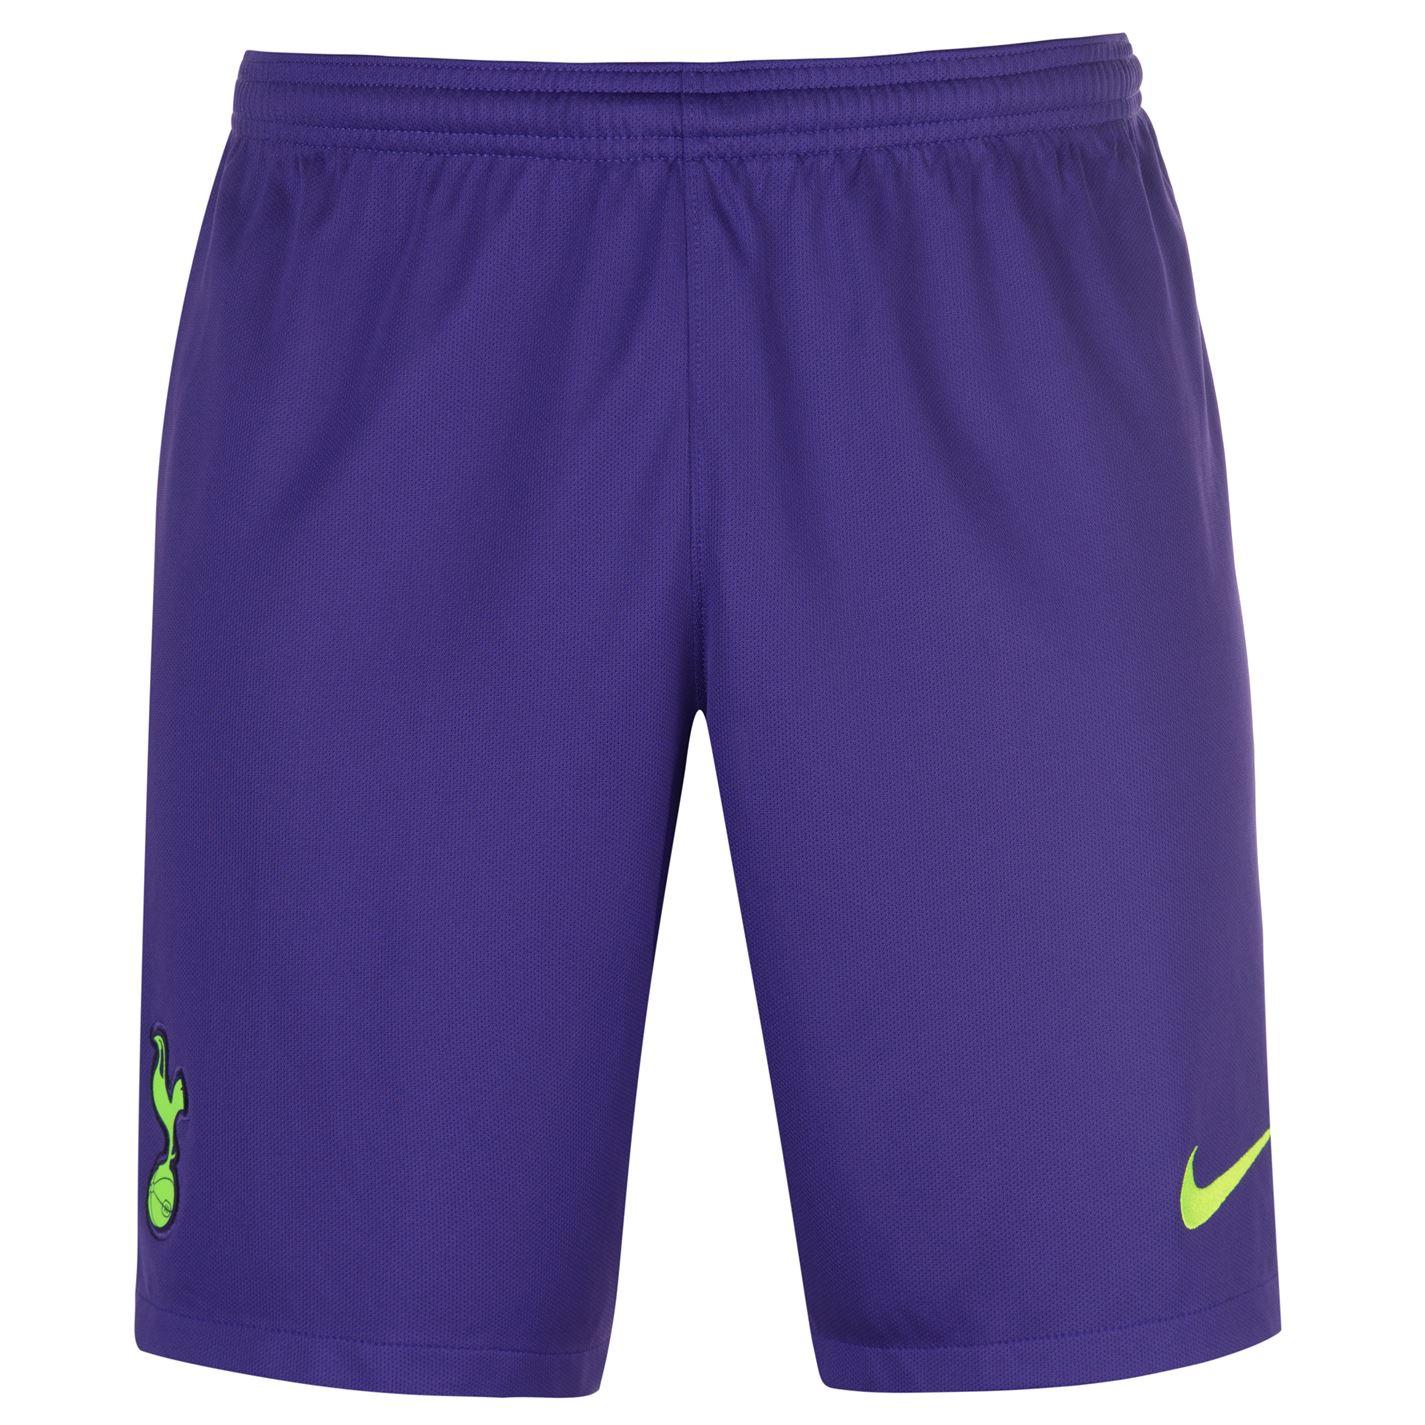 Nike Tottenham Hotspur Home Goalkeeper Shorts 2018 2019 Purple ... 5d20a0b102